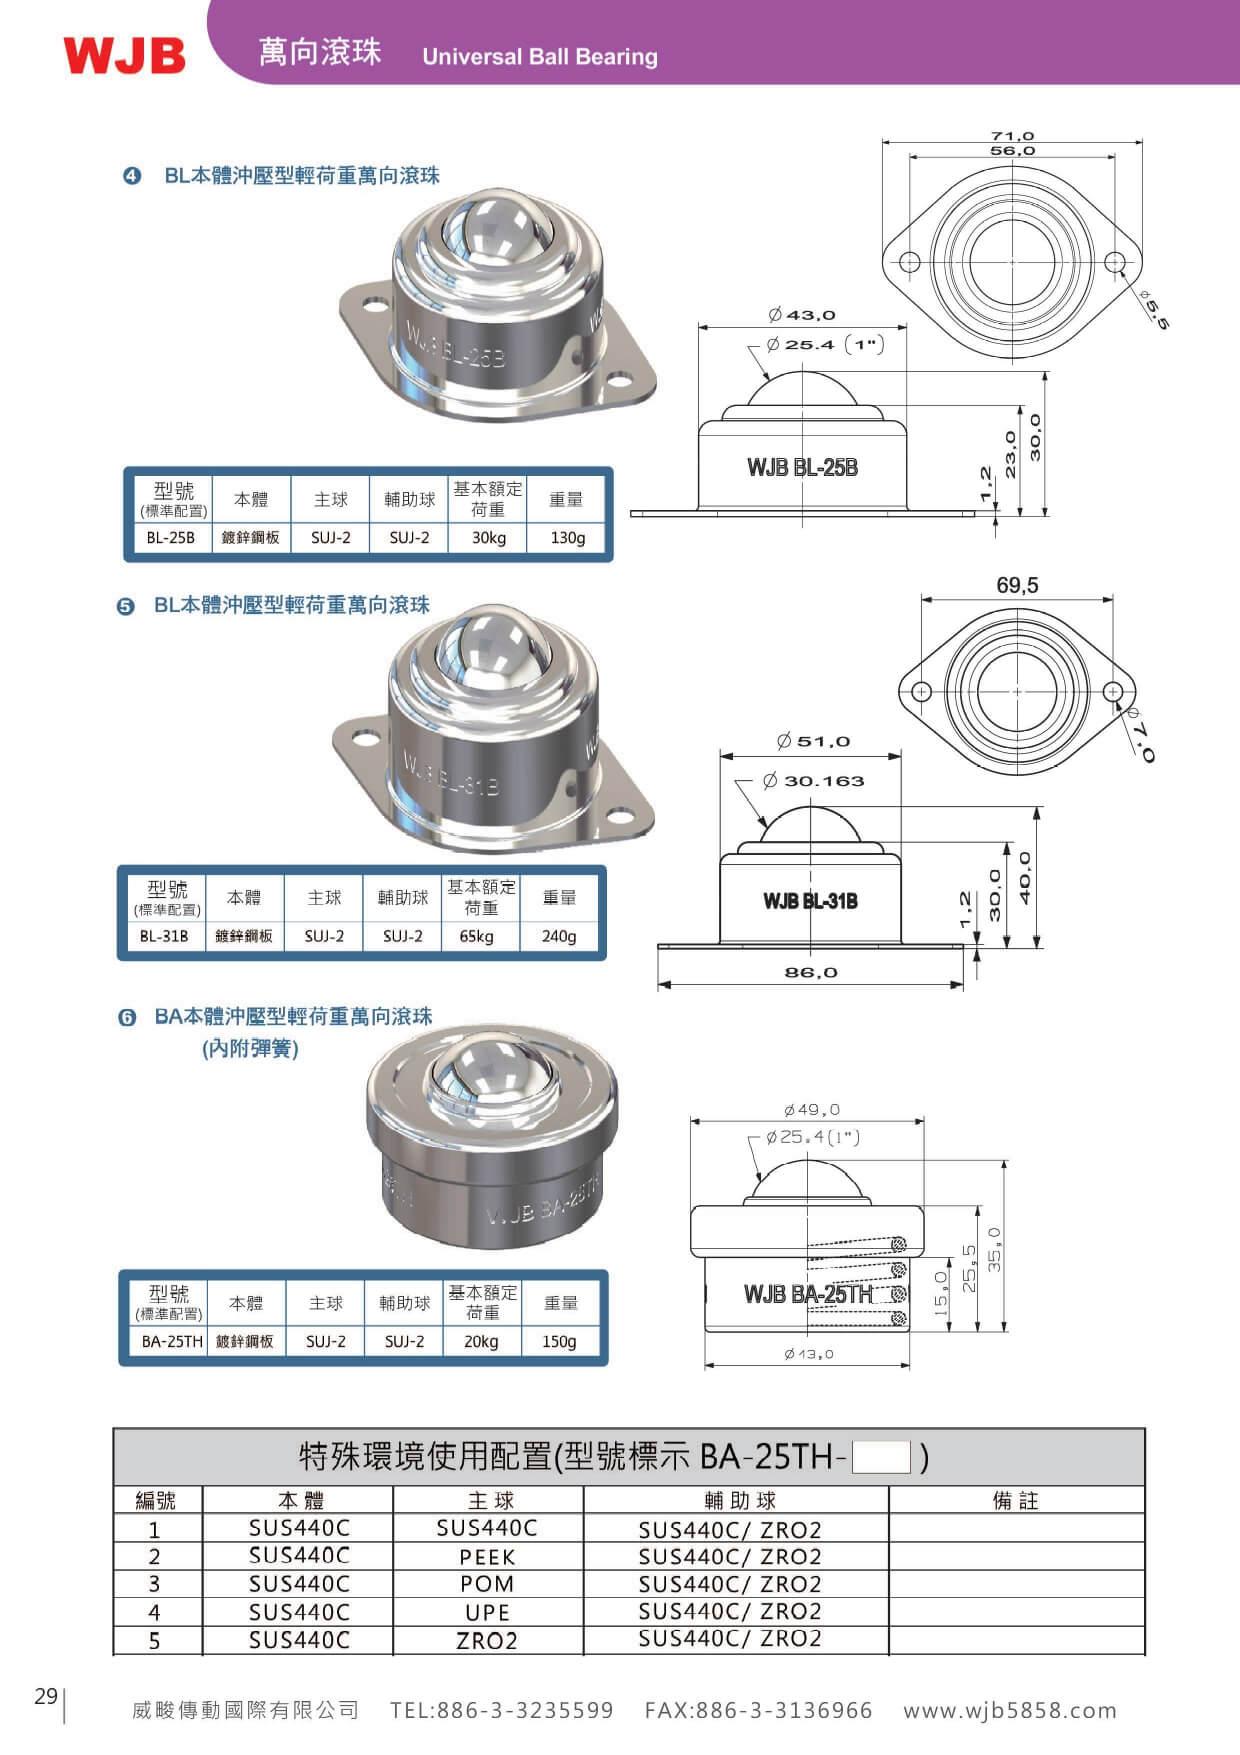 proimages/pro/universal_ball_bearing/BL/BL-2.jpg